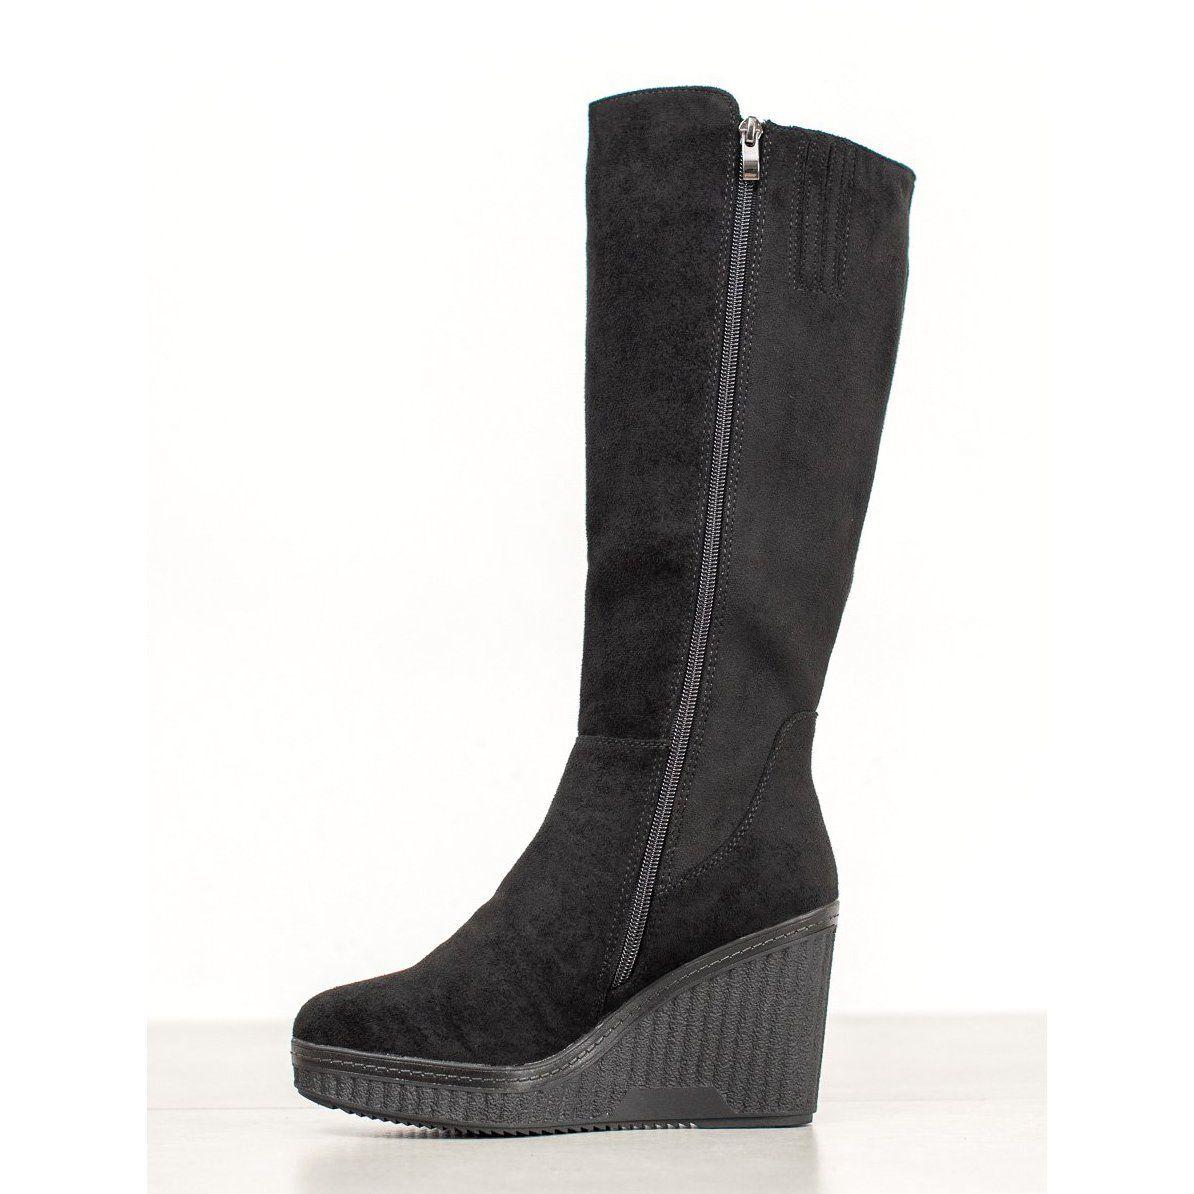 Filippo Czarne Kozaki Na Koturnie Black Wedge Boots Wedge Boots Boots